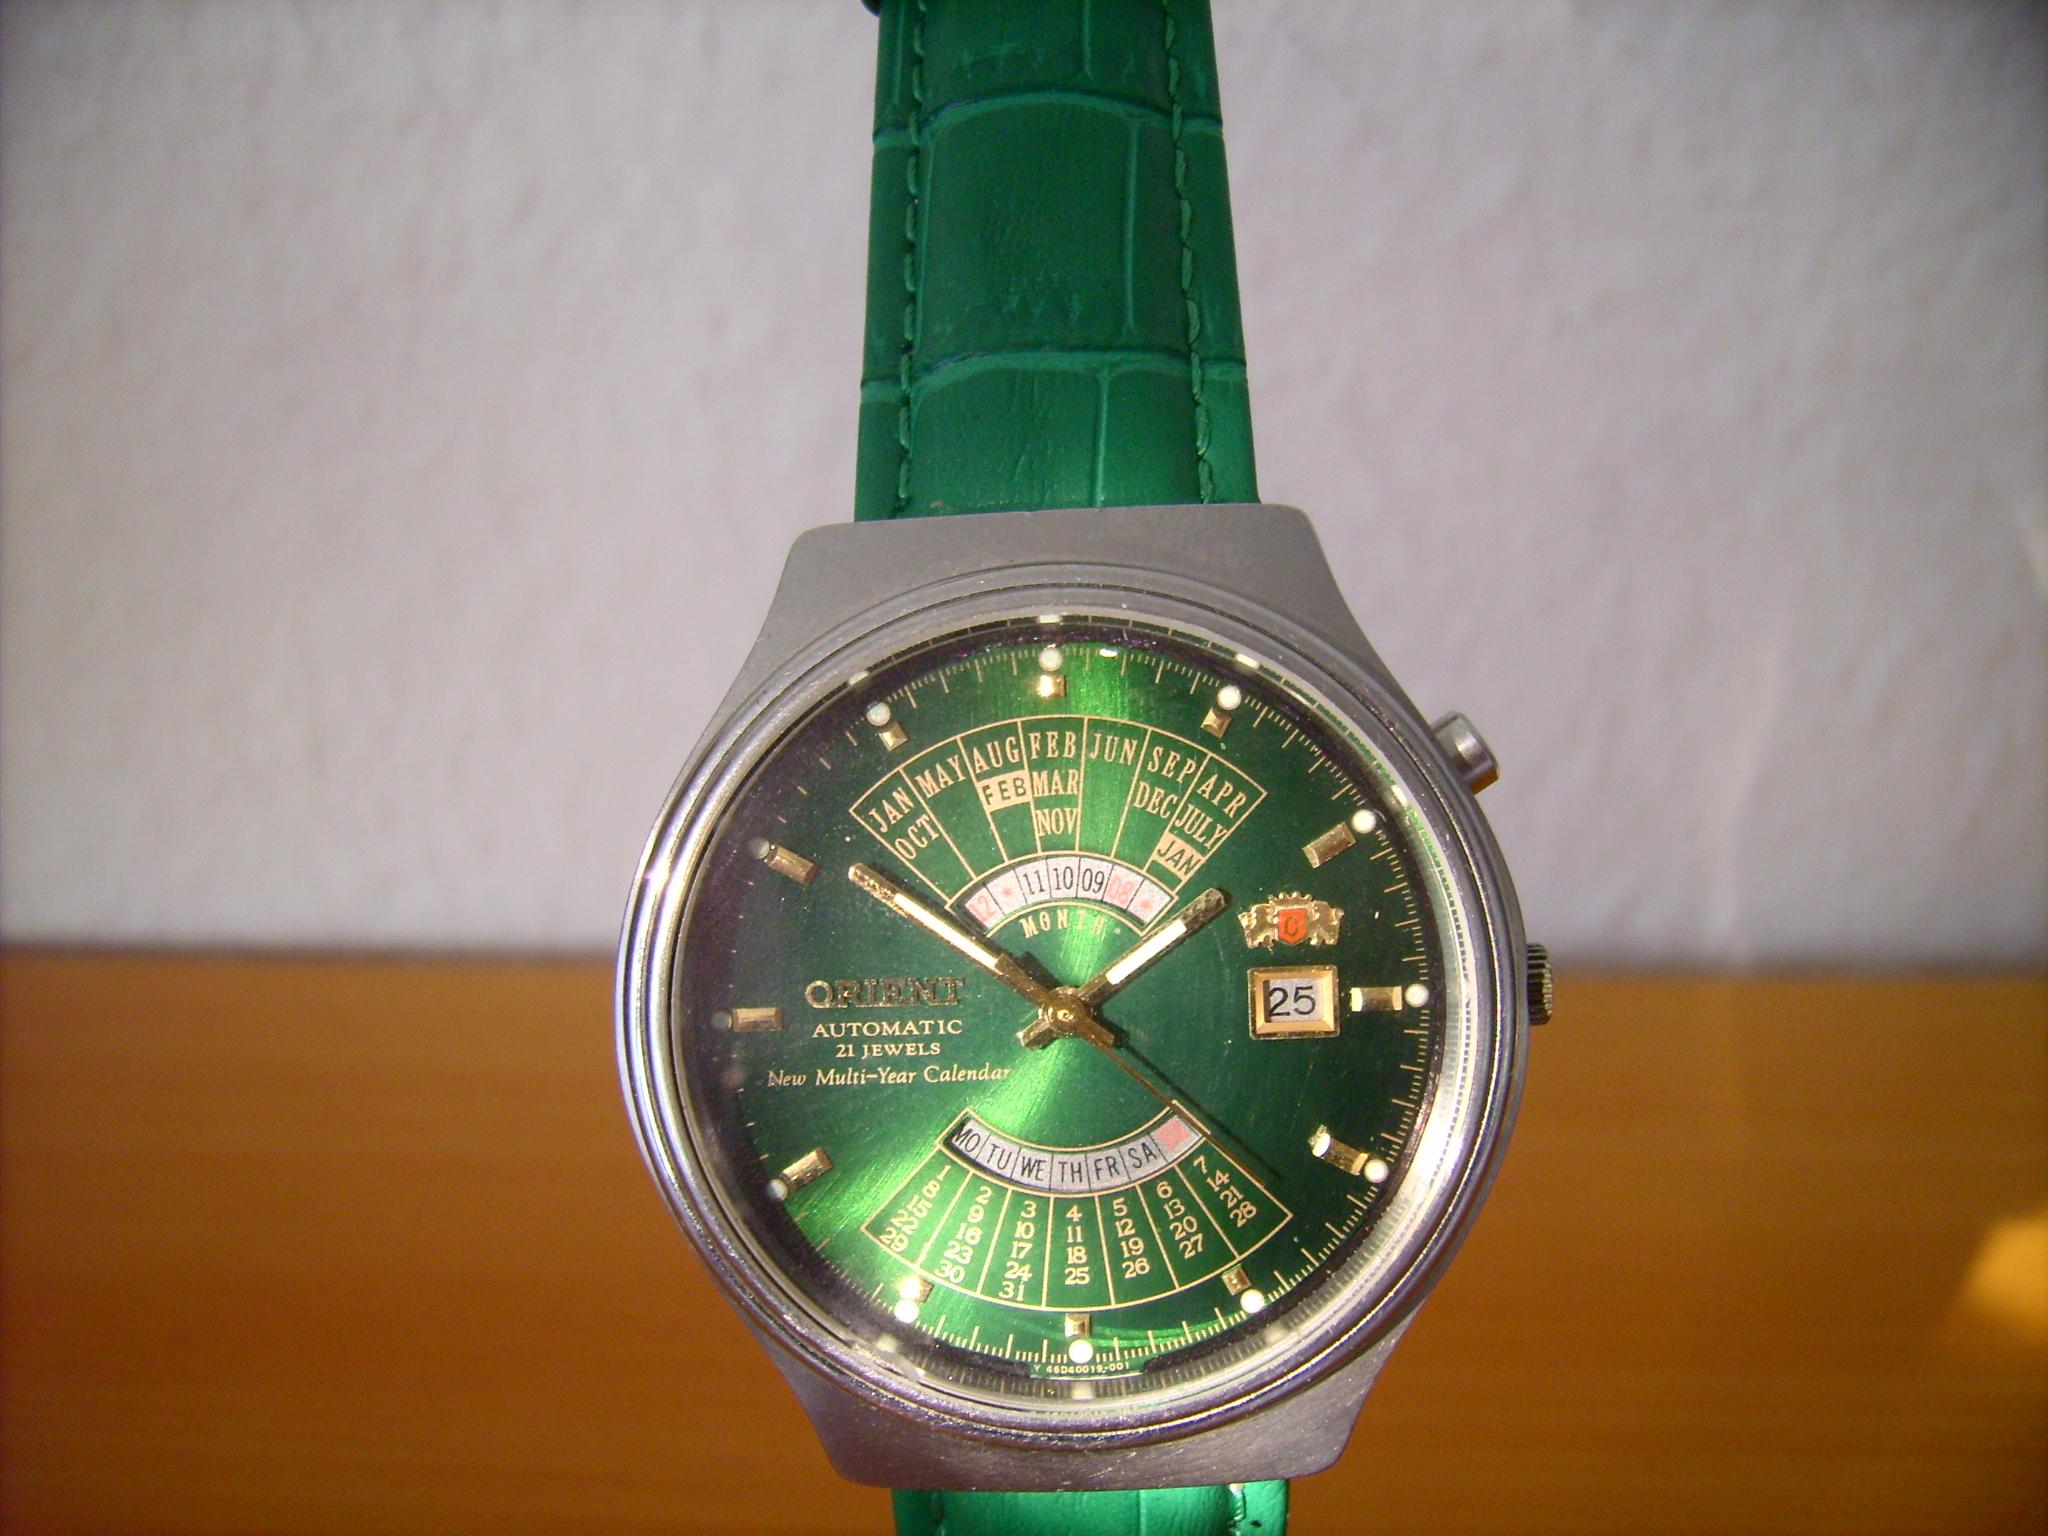 LPIC4960.JPG